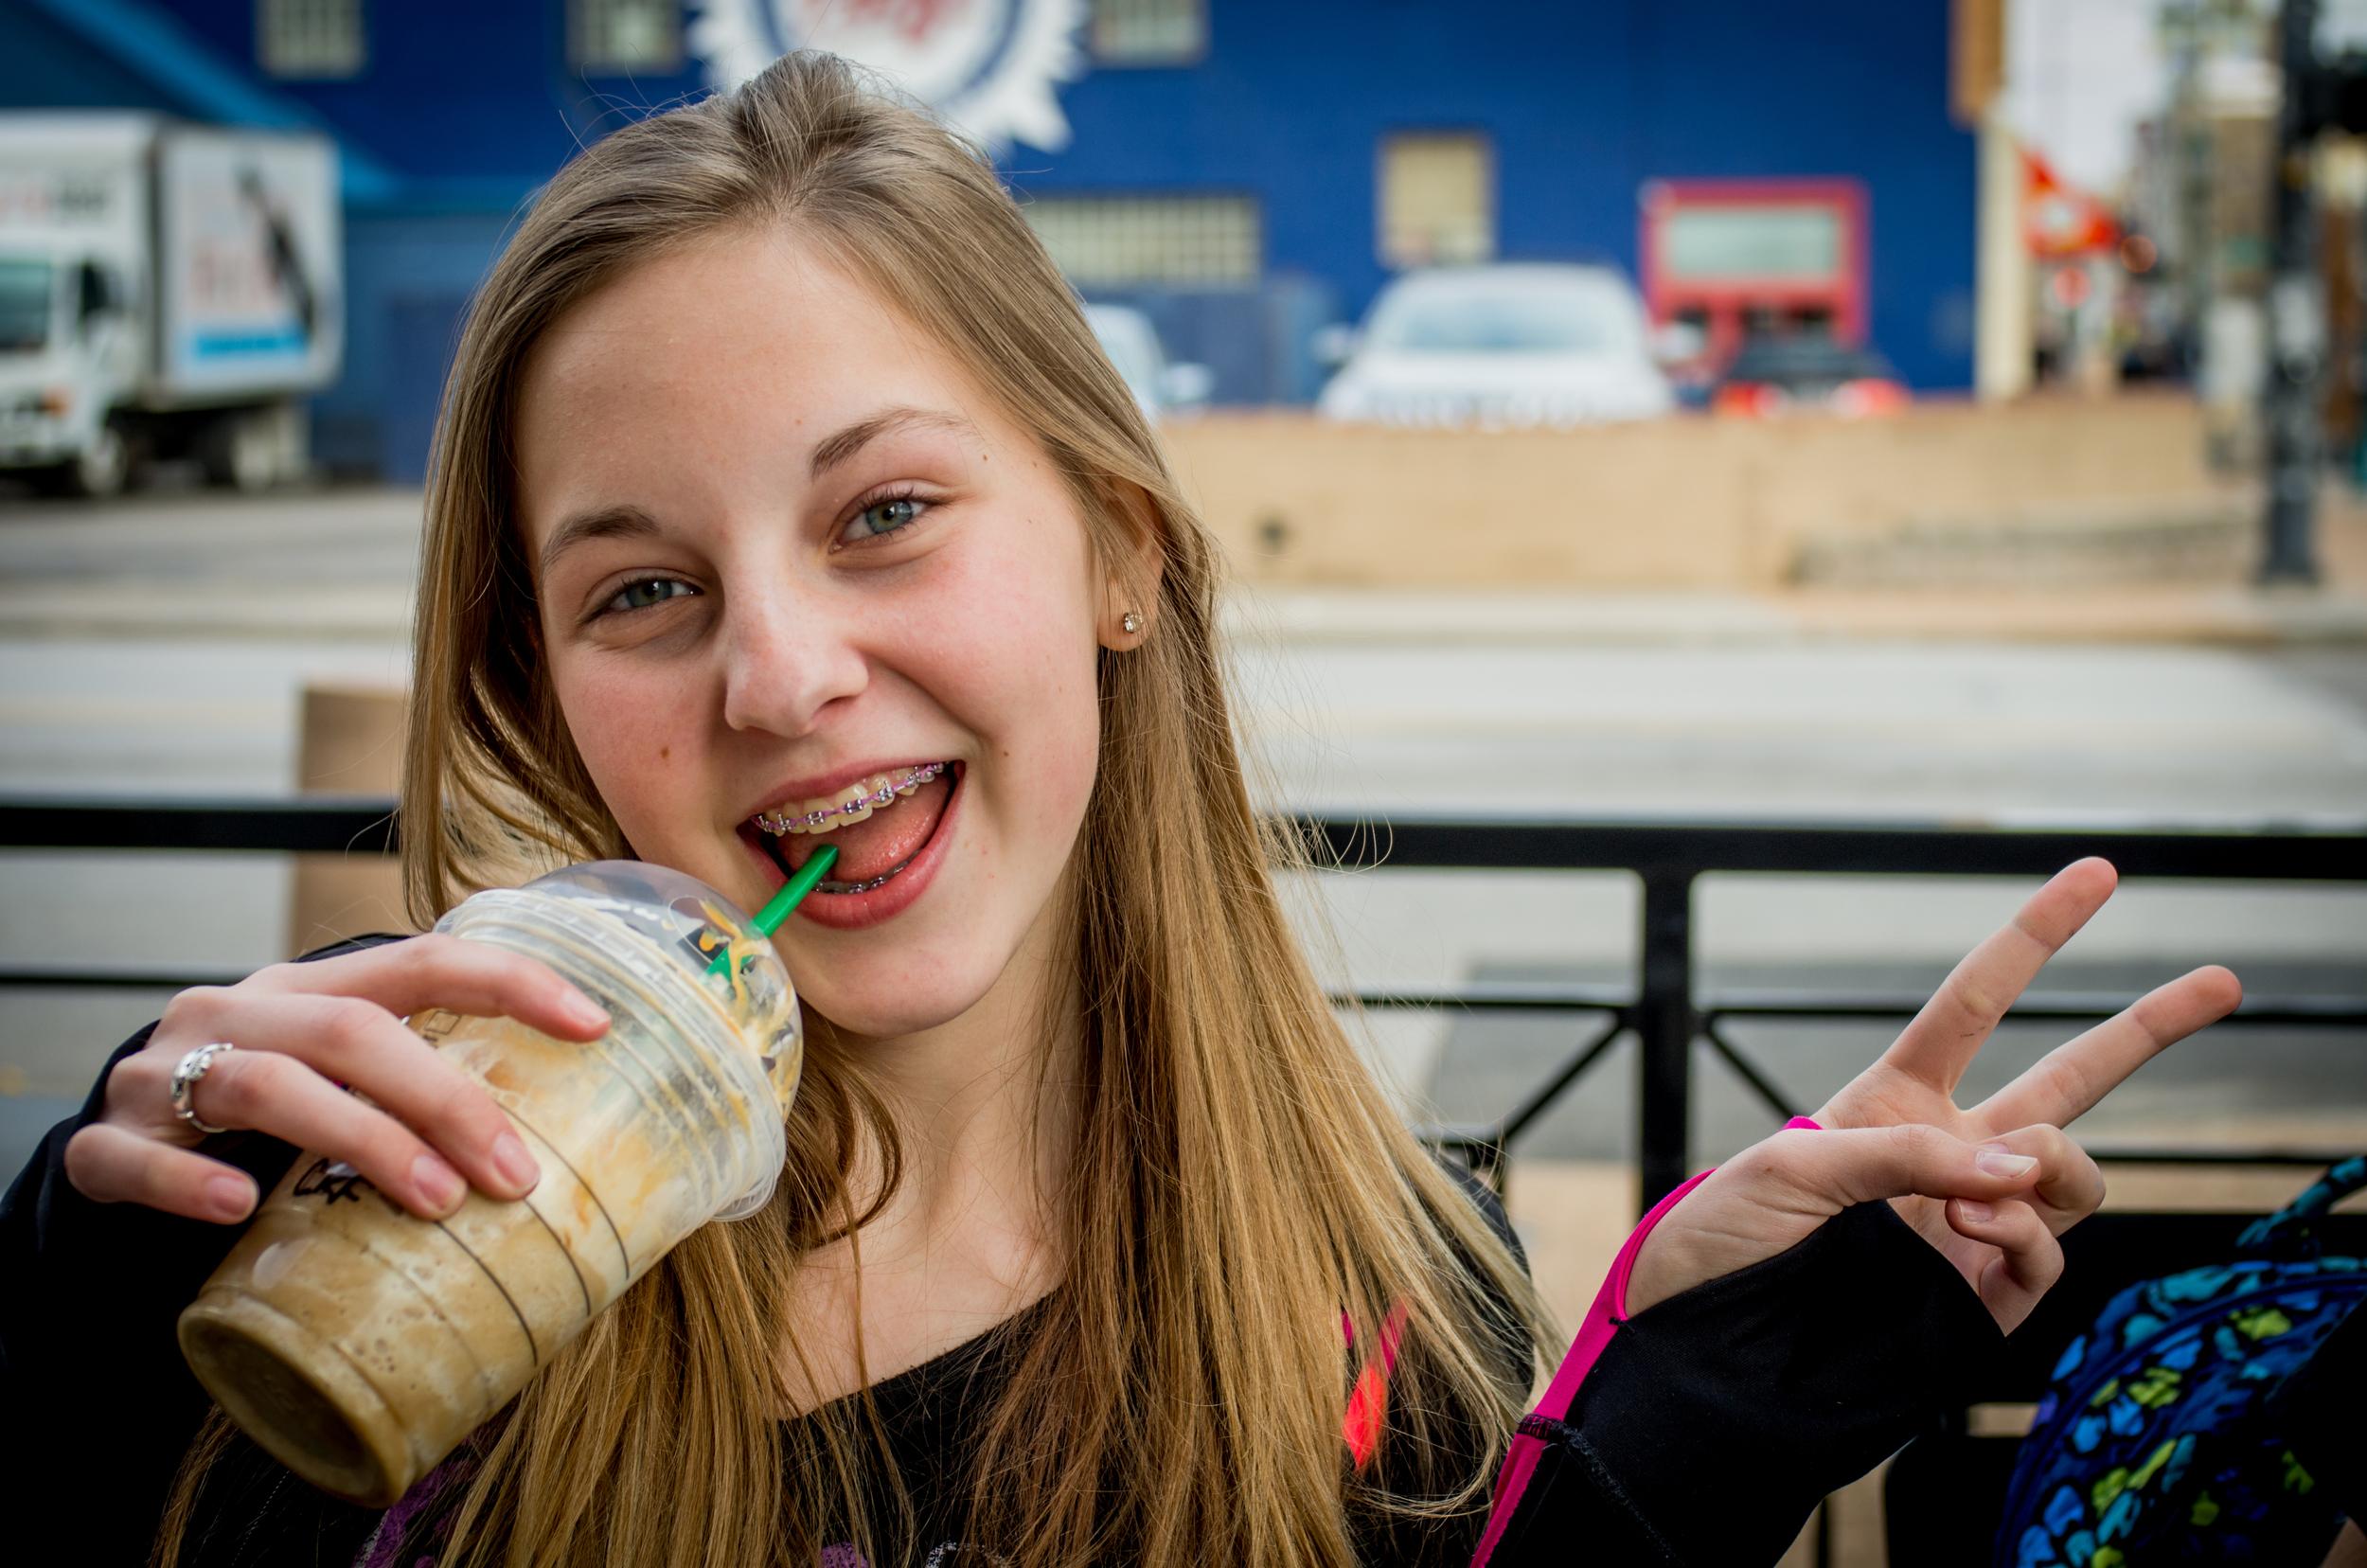 20140401-Starbucks with O-PMG_8219.jpg